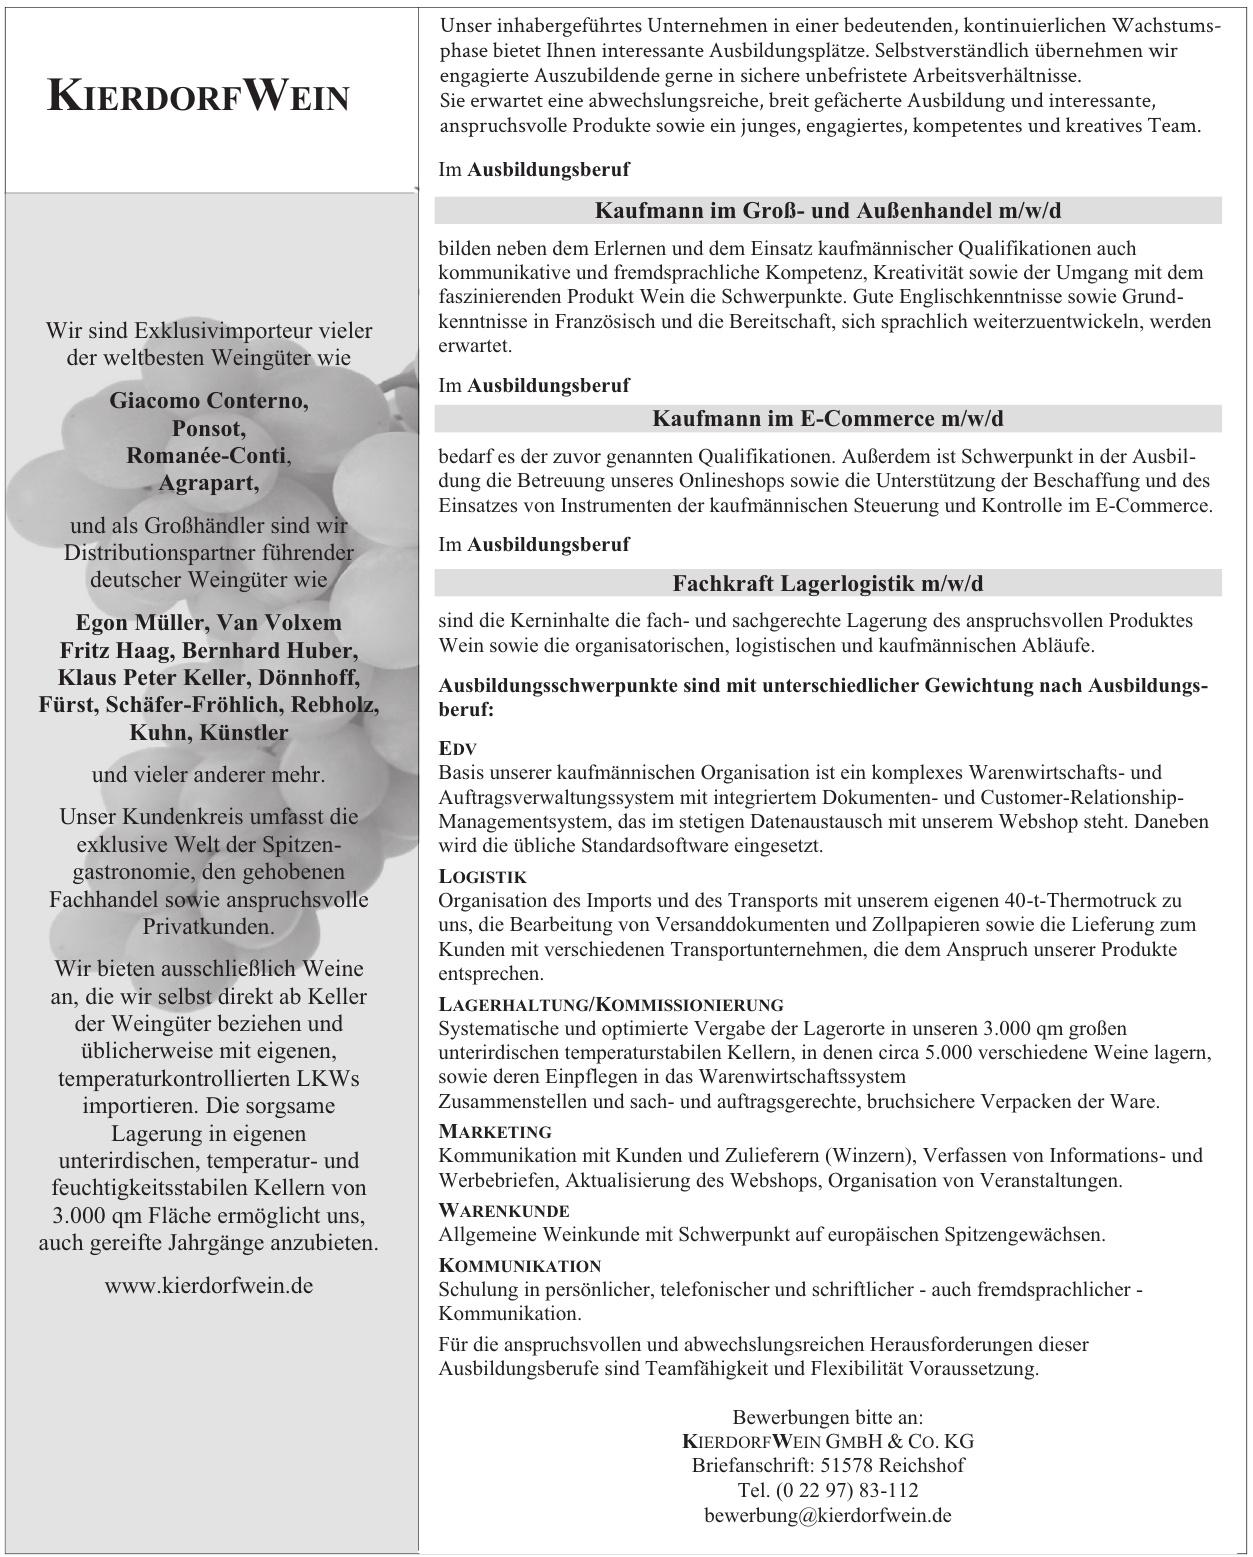 Kierdorfwein GmbH & Co. KG